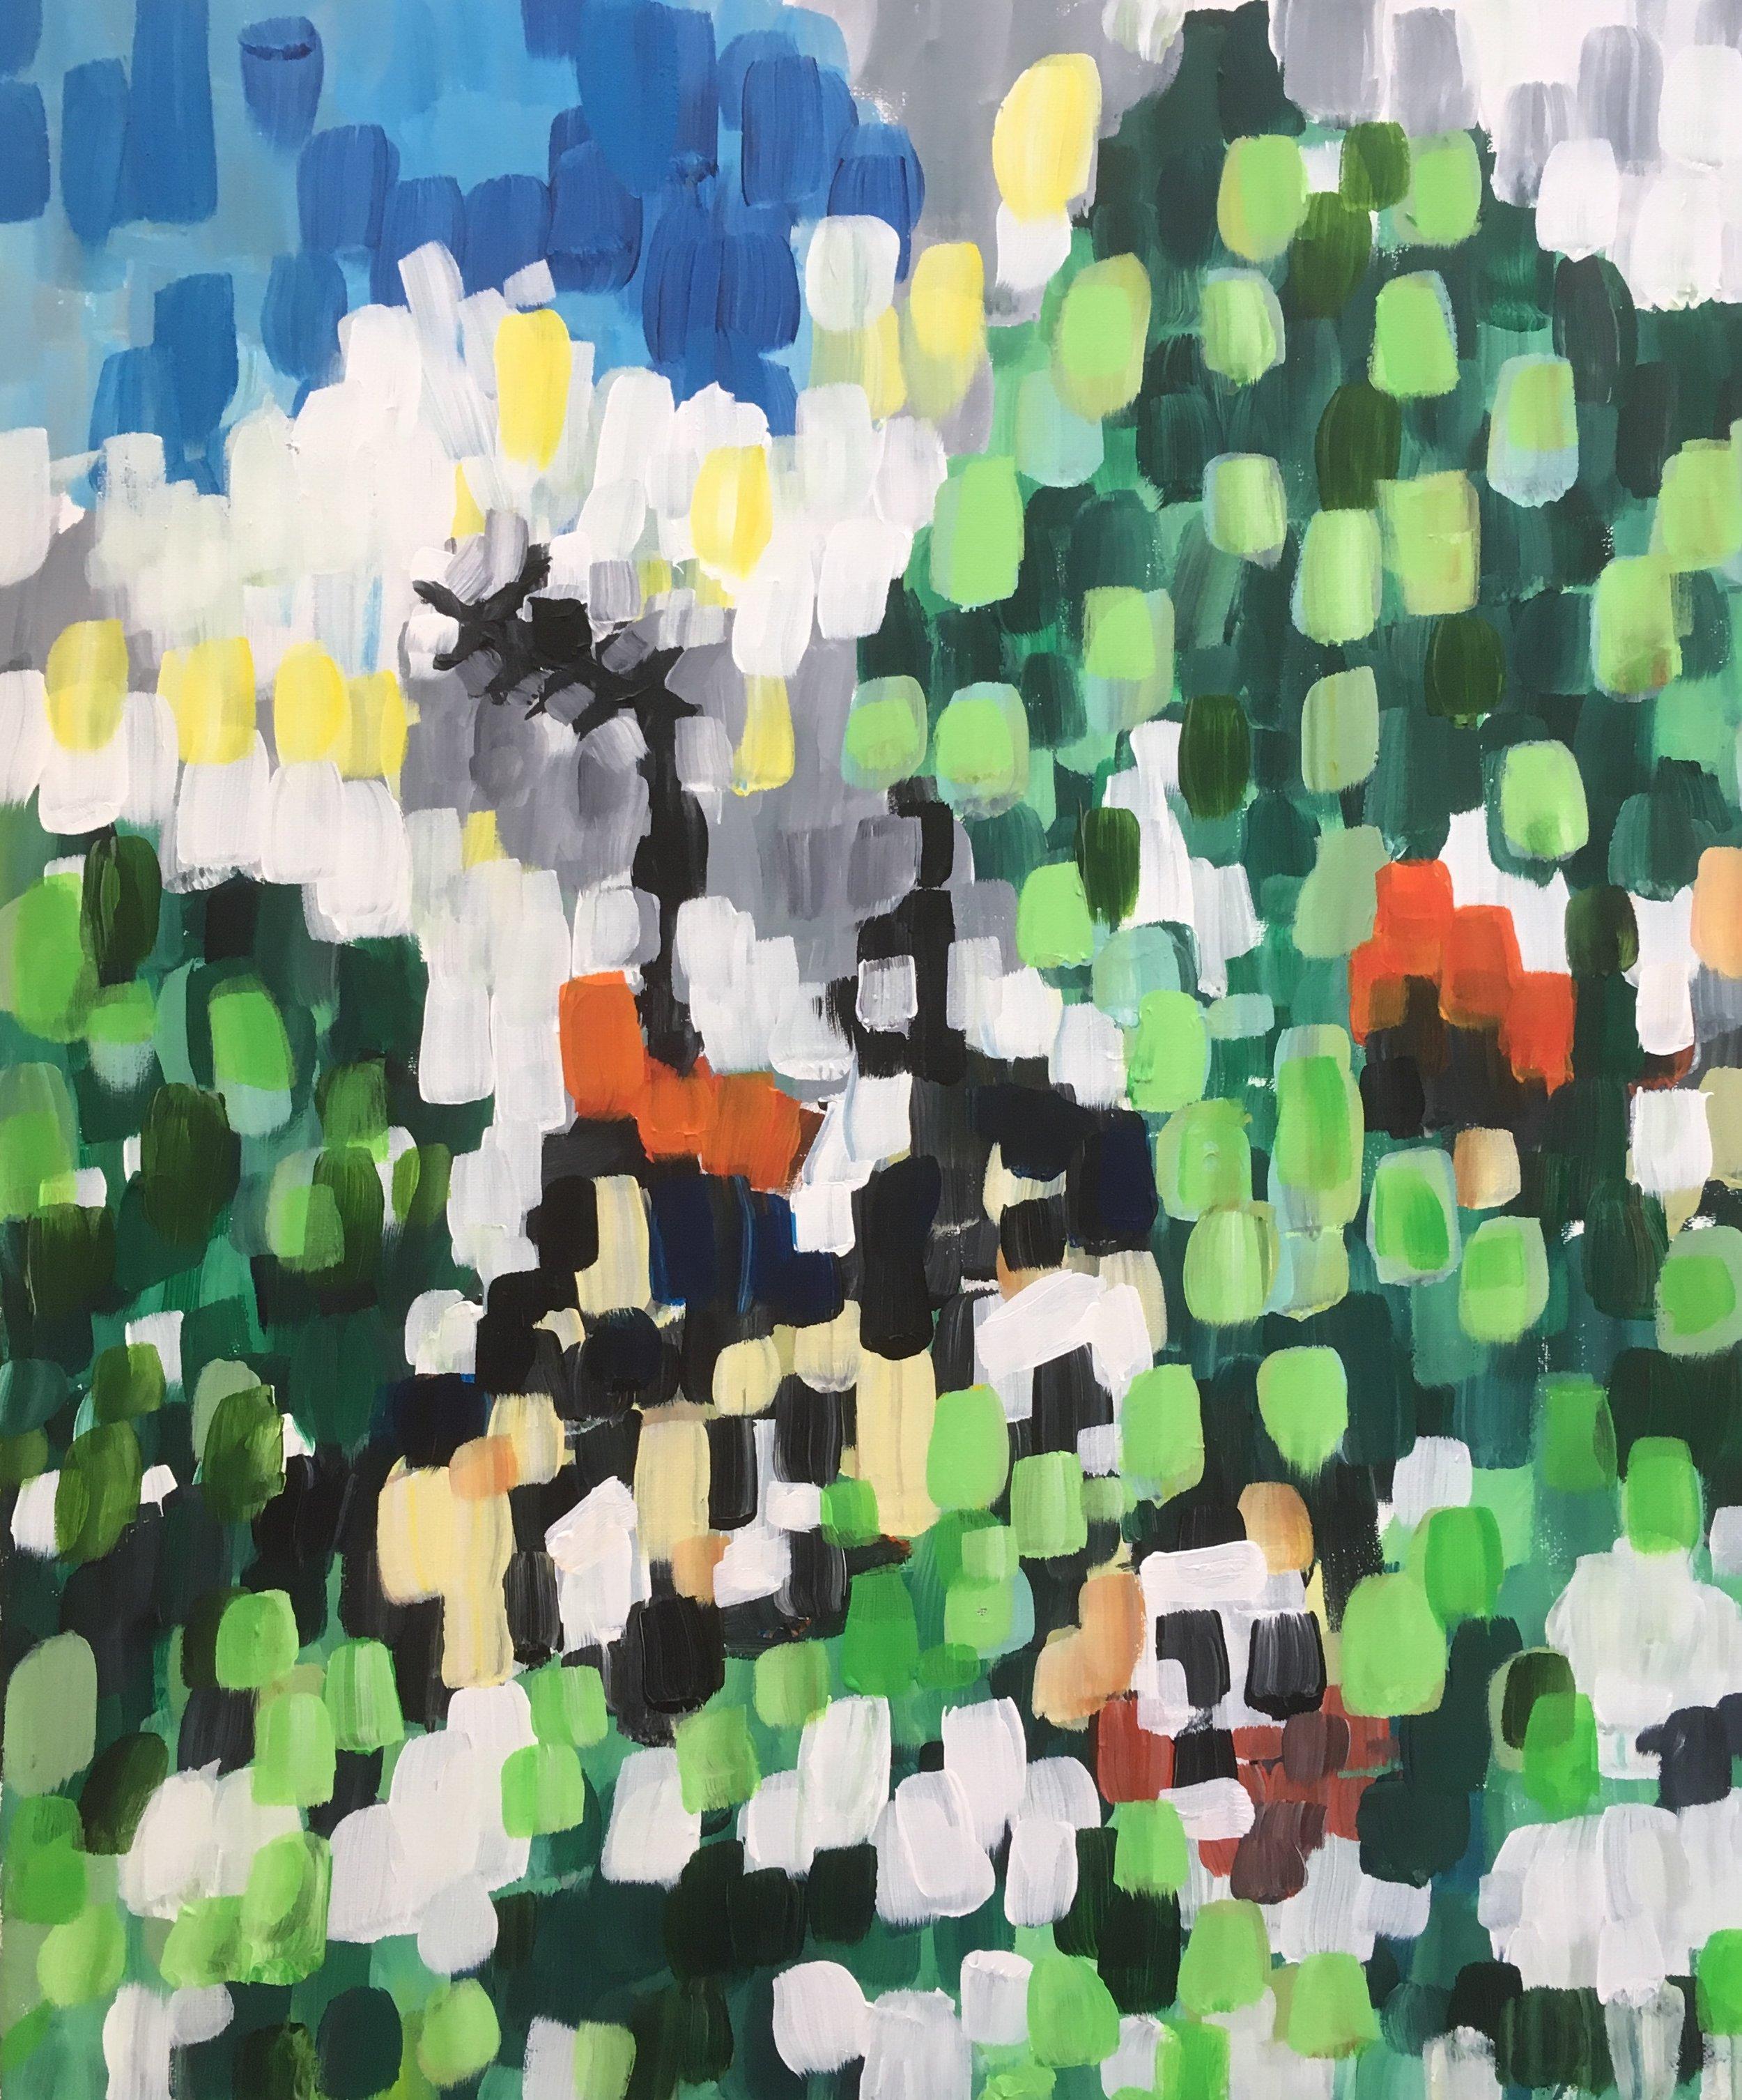 Pimlico garden  acrylic on canvas  50 by 60 by1.5 cm  £700  unframed